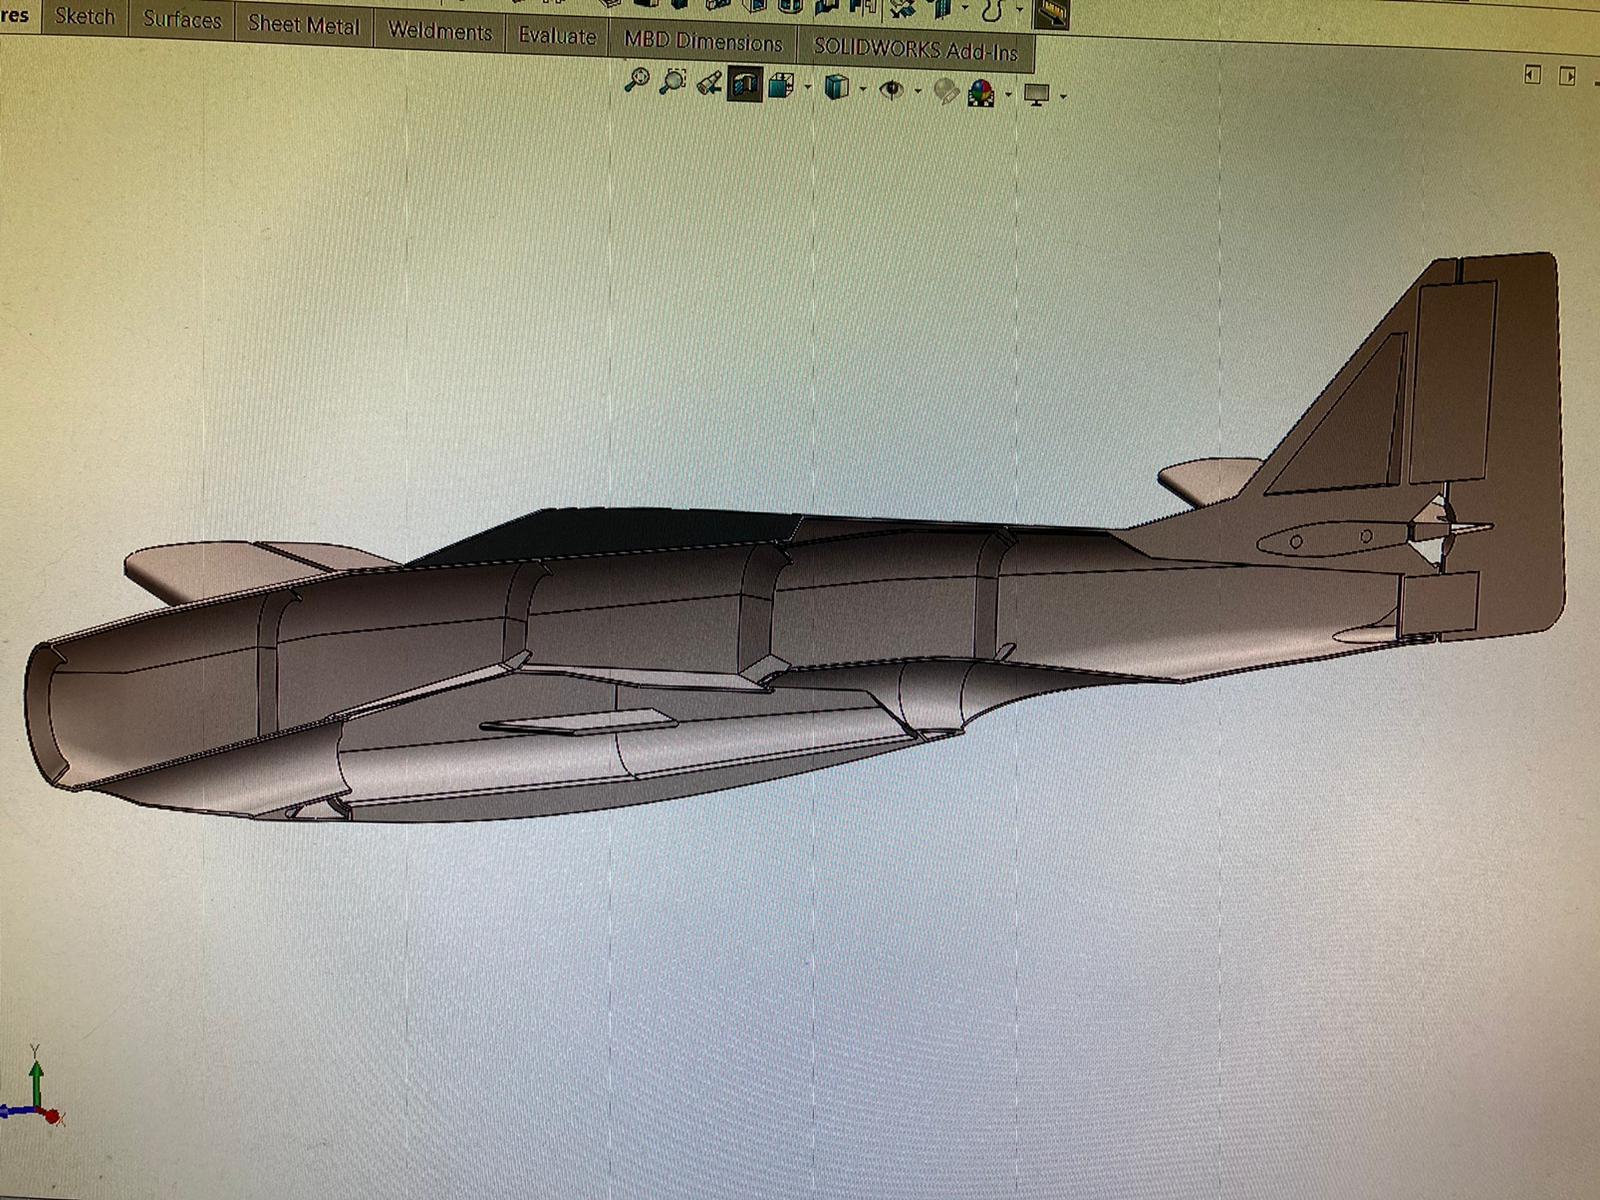 F7ED5DF1-7C7A-4955-9F36-1206DAE21638.jpeg